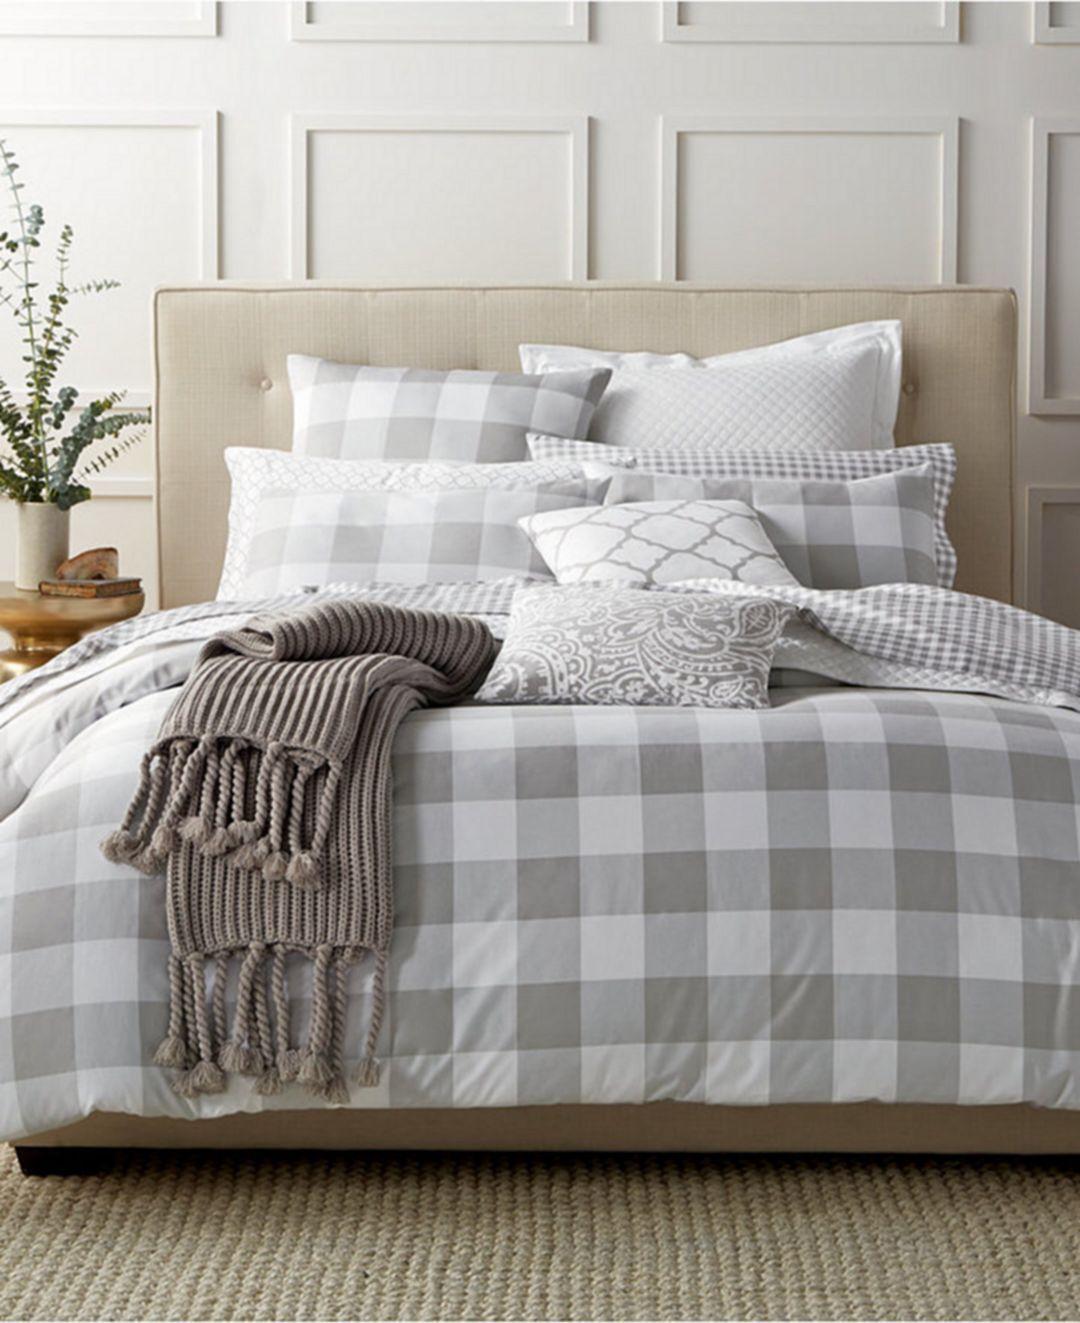 Farmhouse bed 2727 farmhouse bedding sets bedroom decor